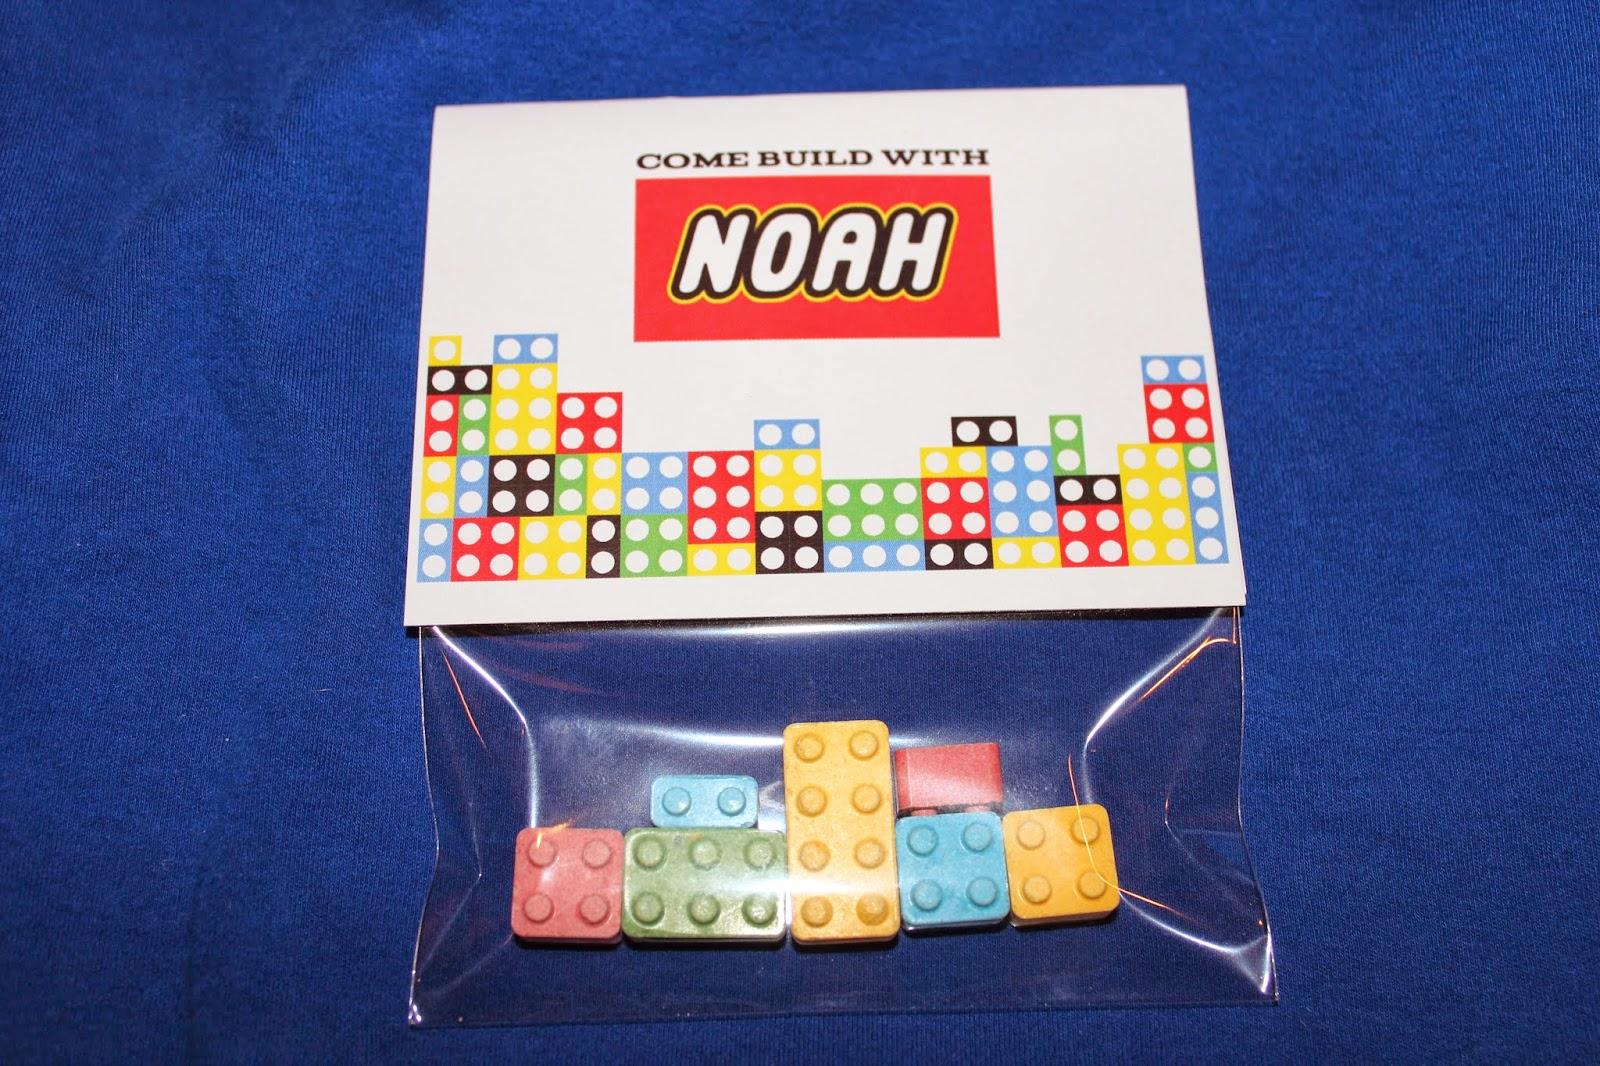 choosing joy today  noah u0026 39 s 6th birthday lego party invitations